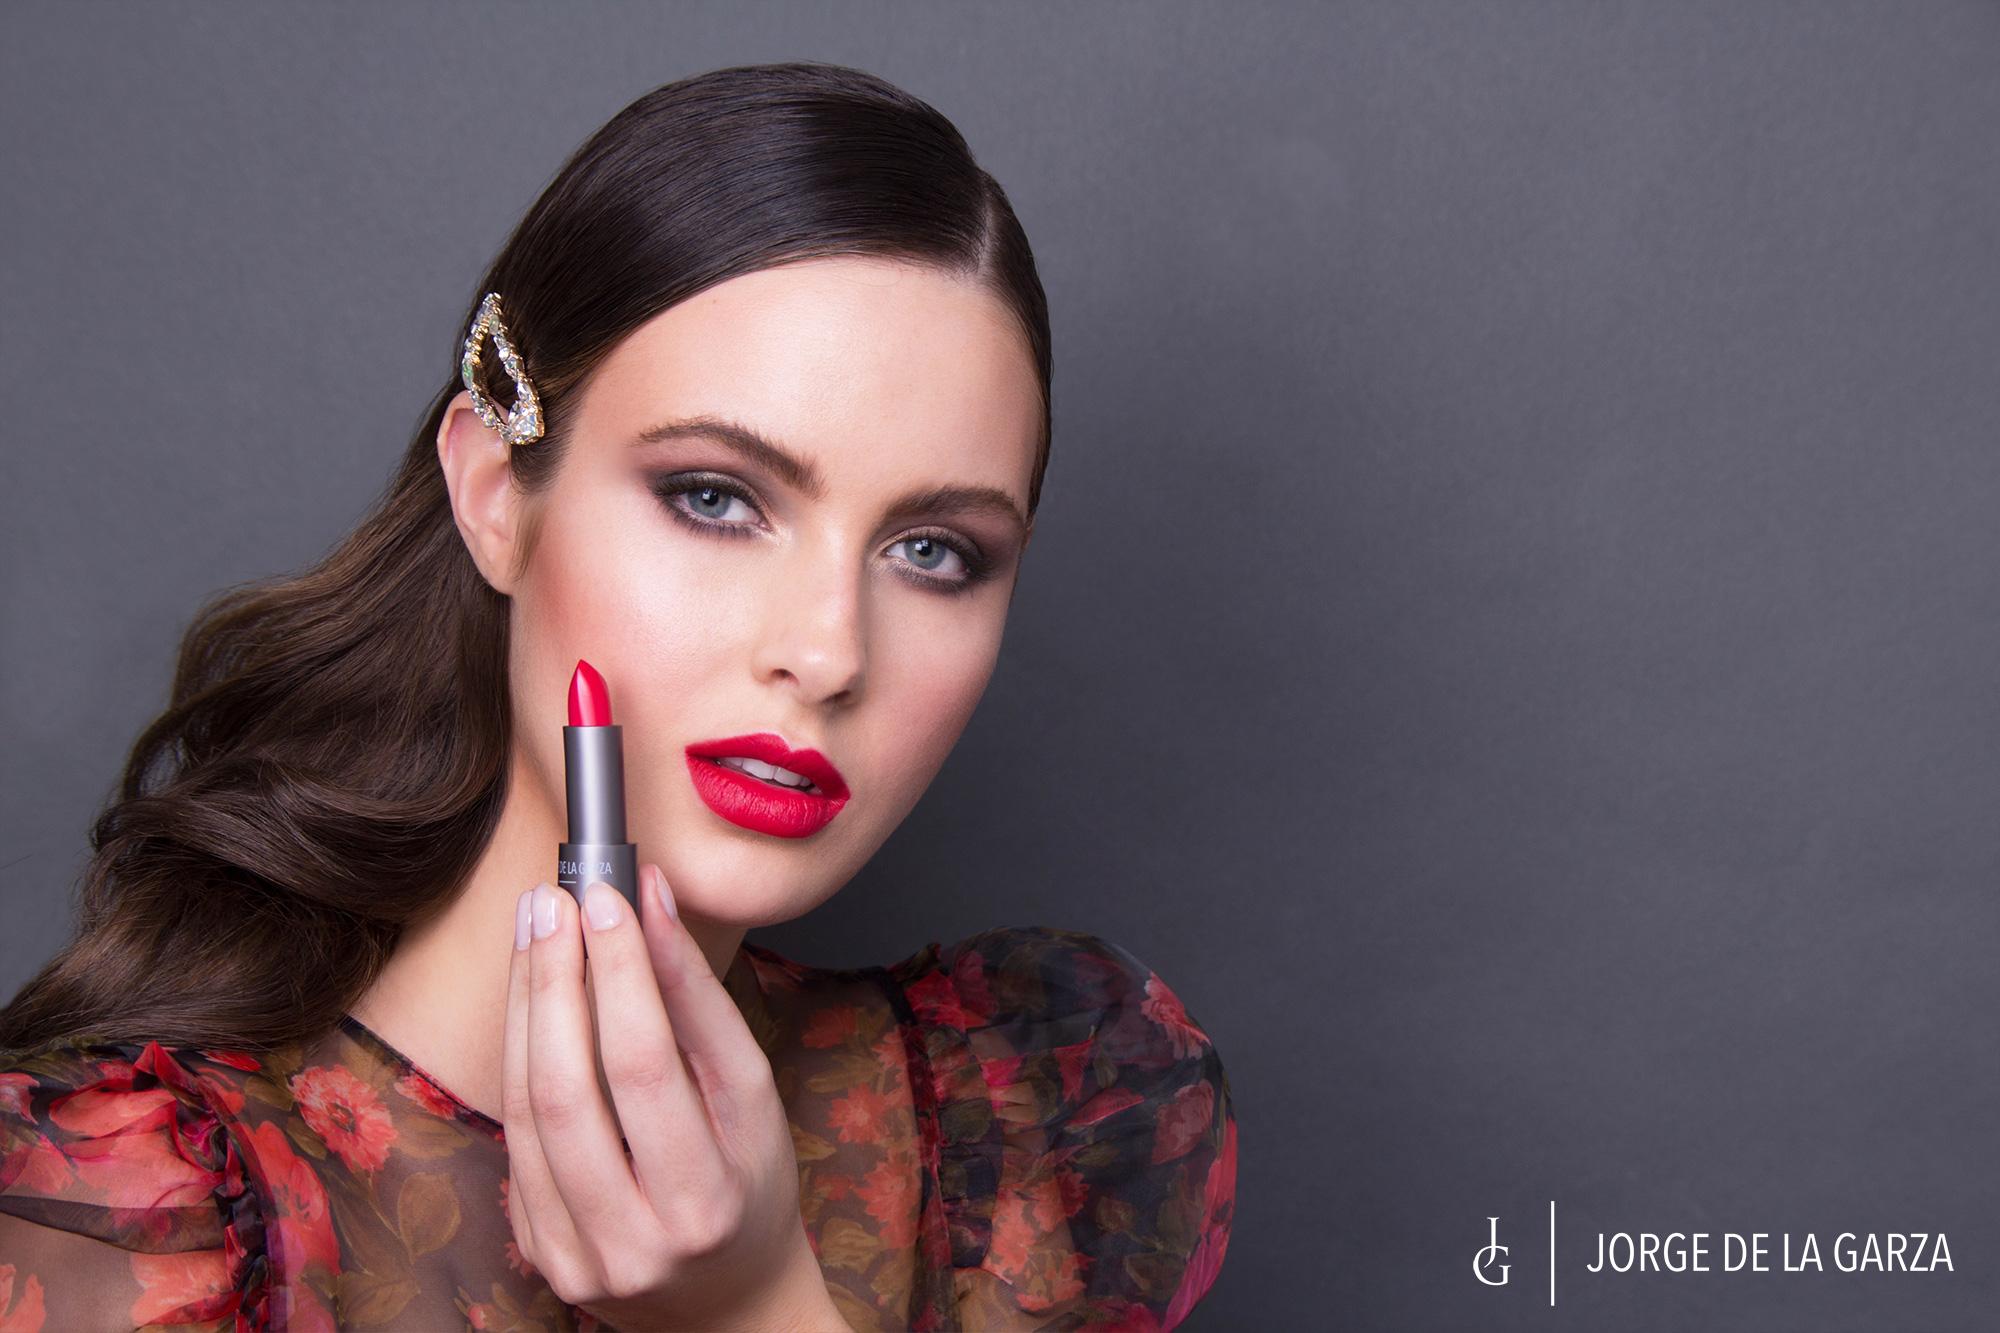 Fotos modelo maquillaje Jorge de la Garza